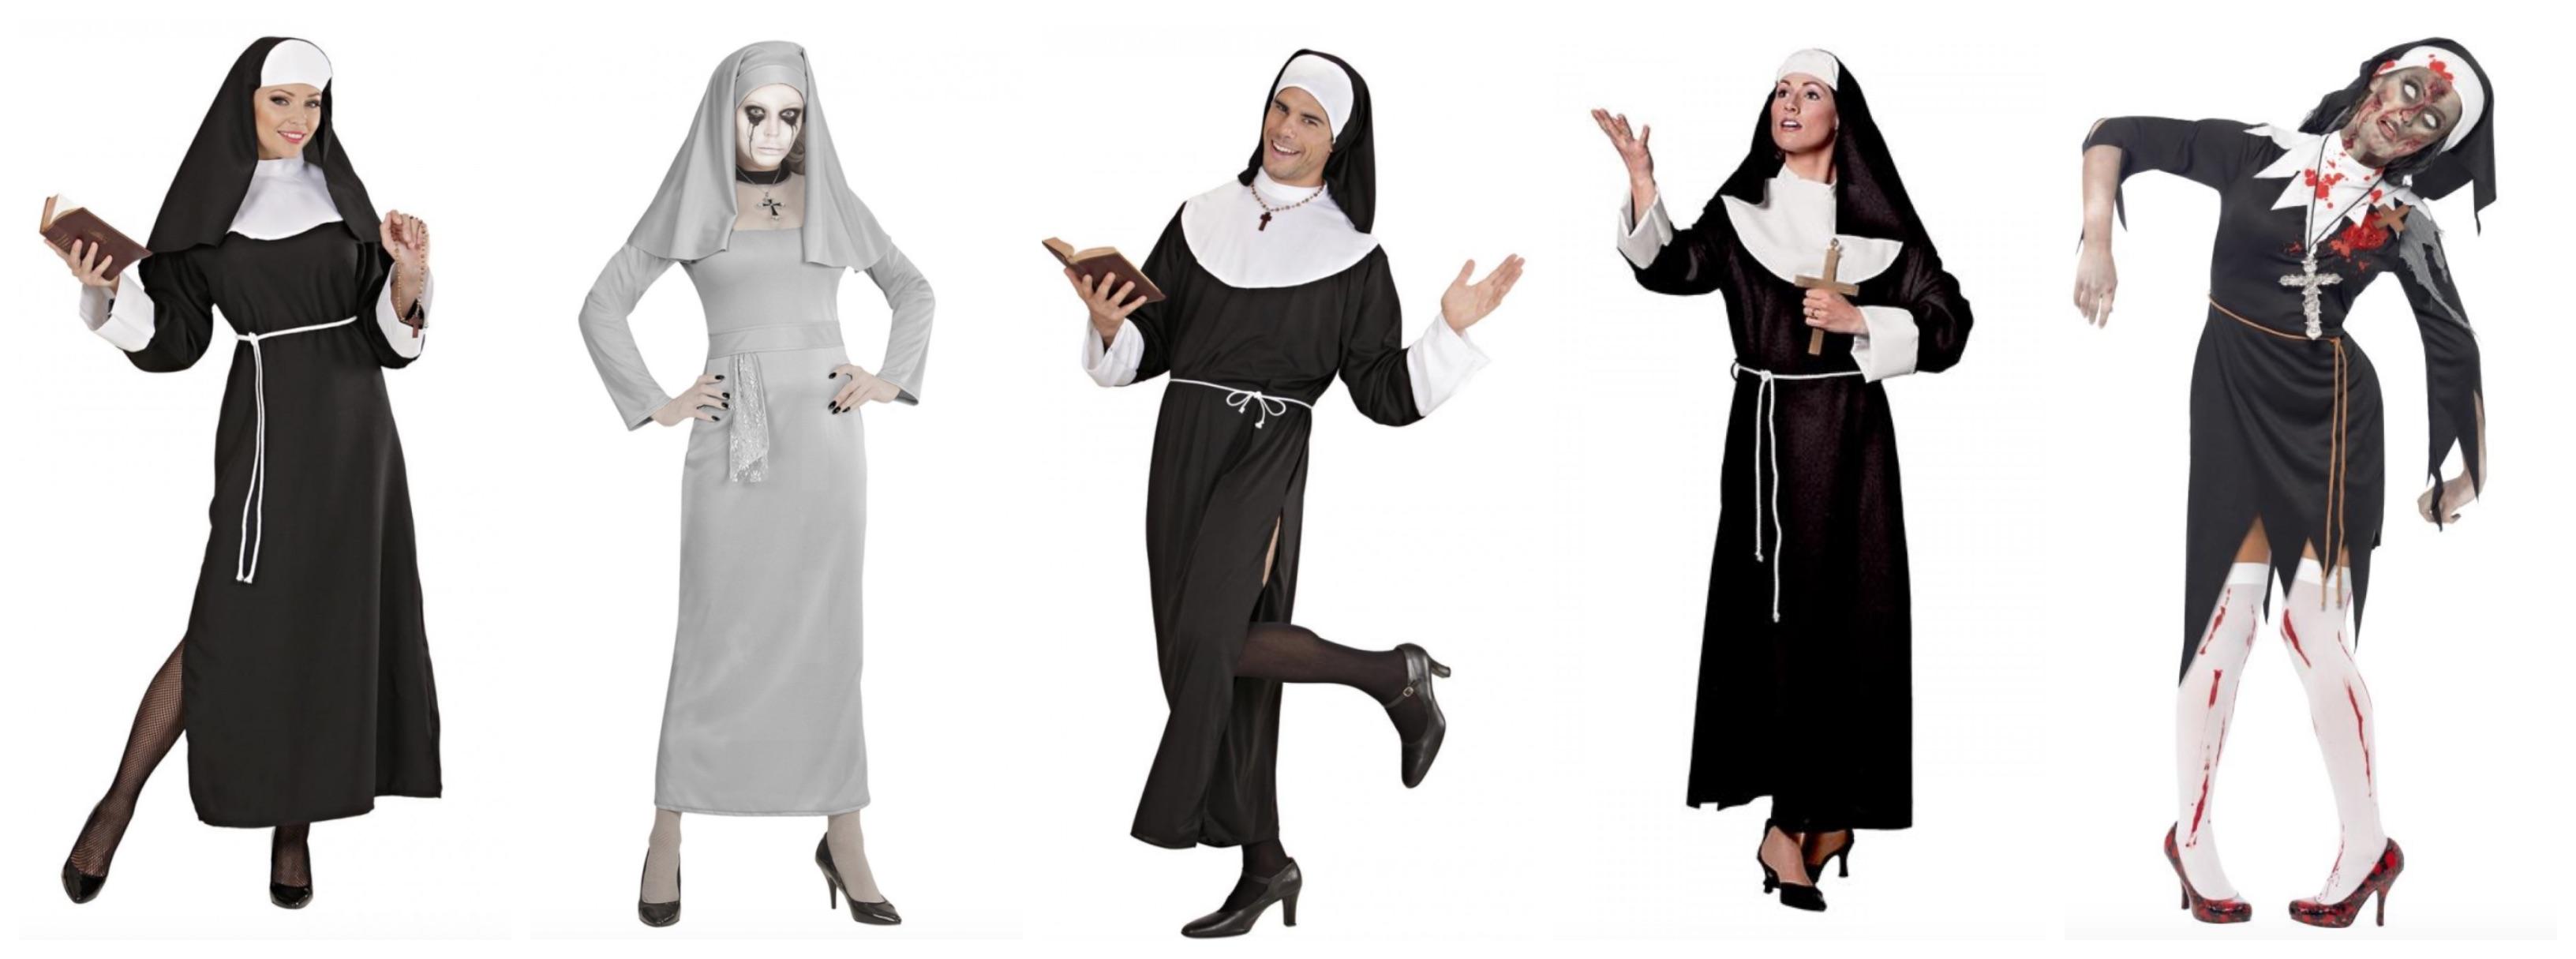 nonne kostume til voksne - Nonne kostume til voksne